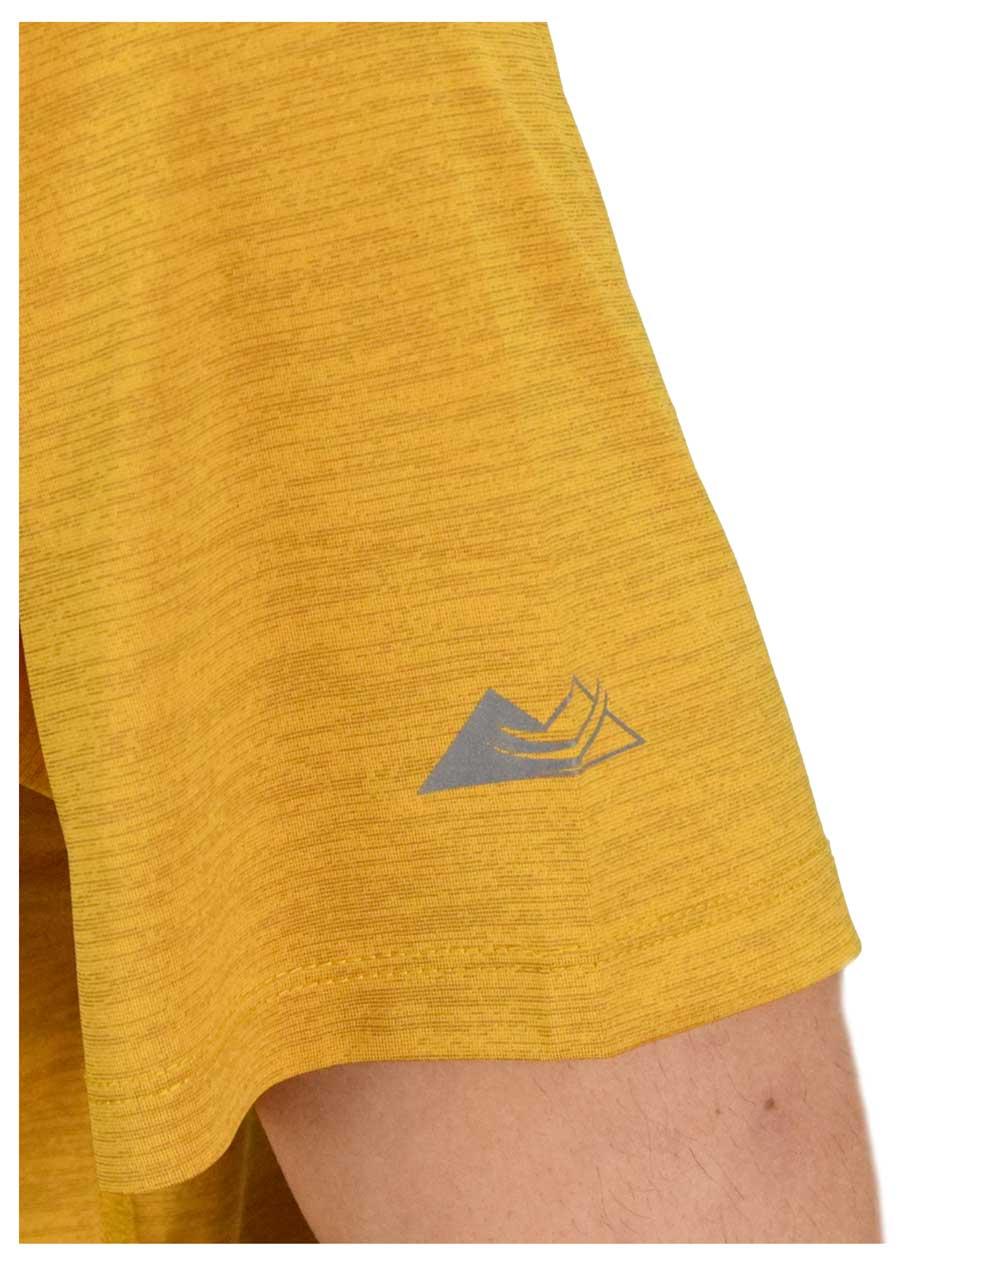 Columbia Trinity Trail™ Graphic Tee (AO0360-790) Branded Sunshade